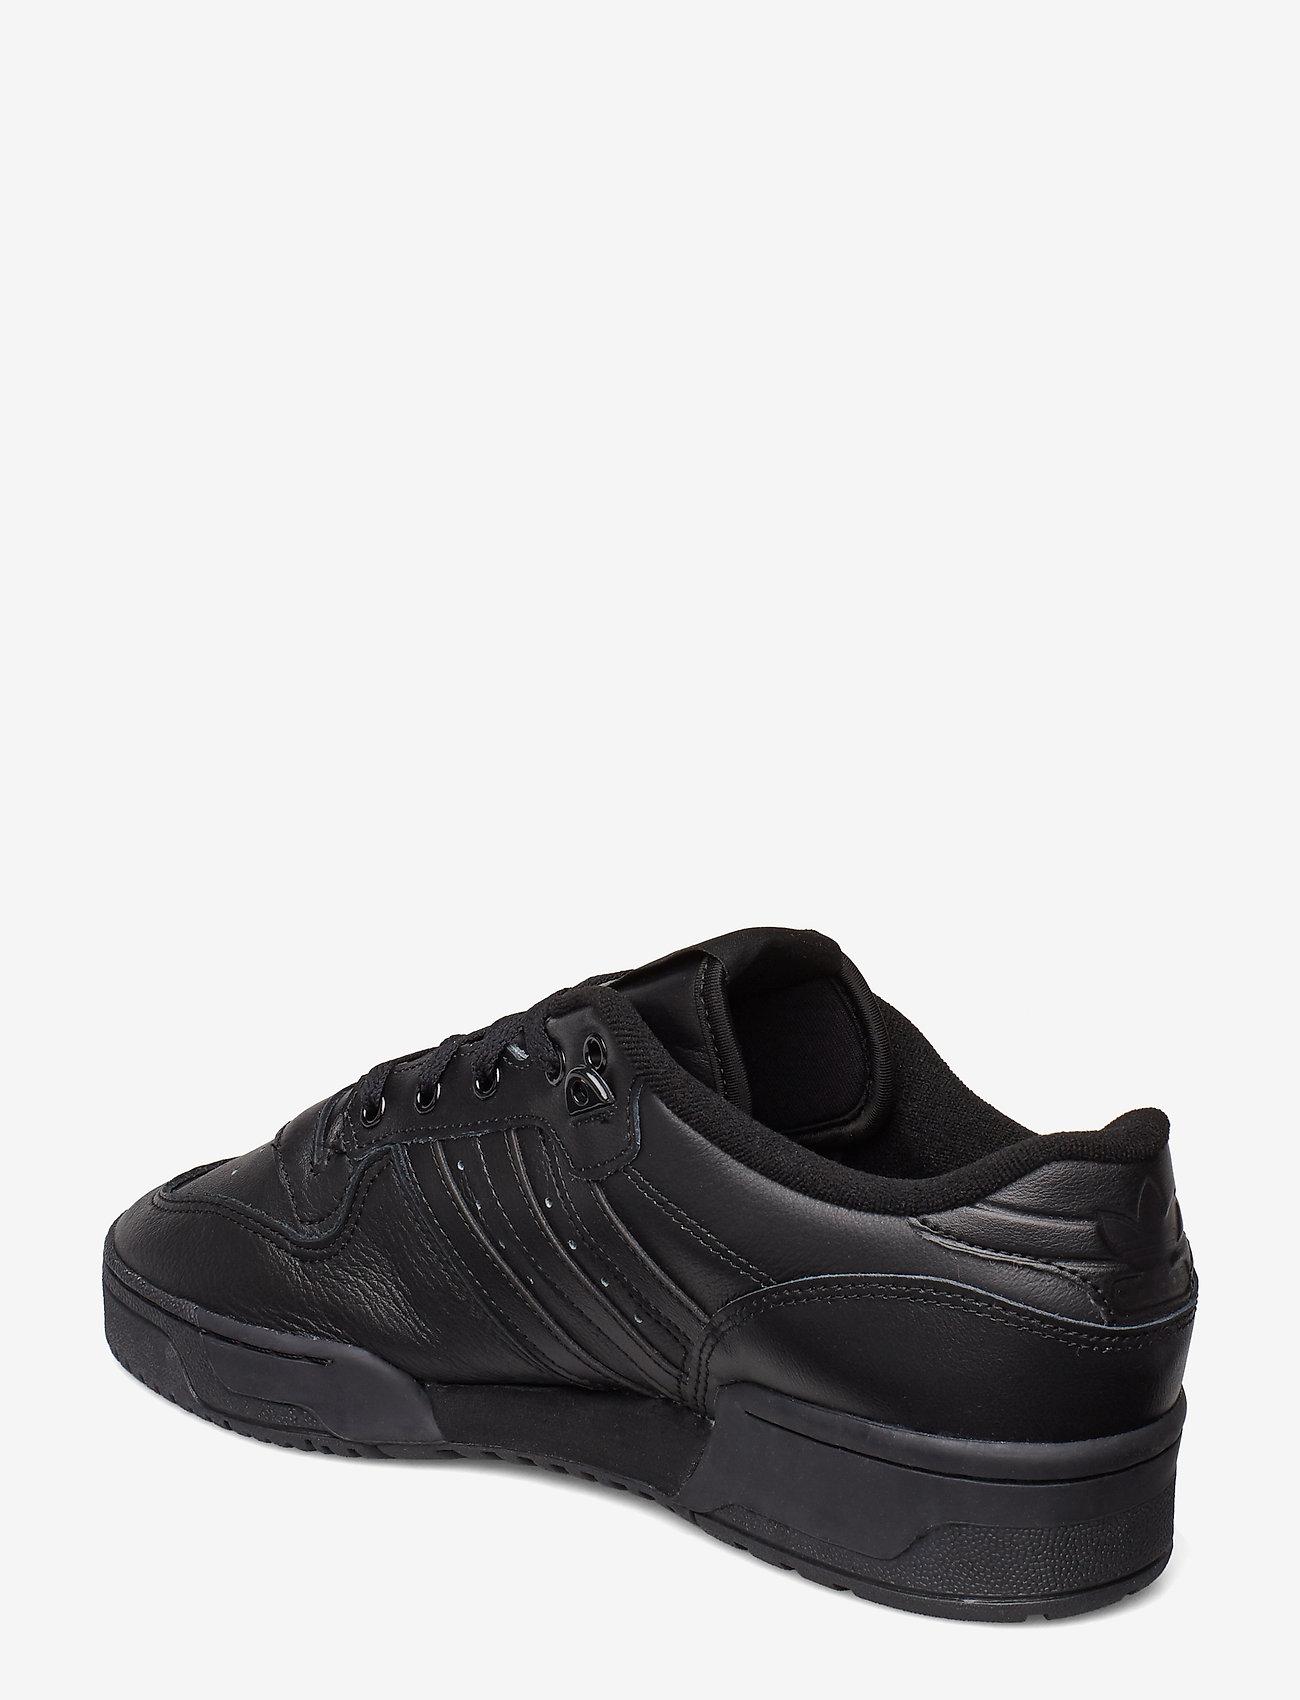 Rivalry Low (Cblack/cblack/ftwwht) (449.40 kr) - adidas Originals